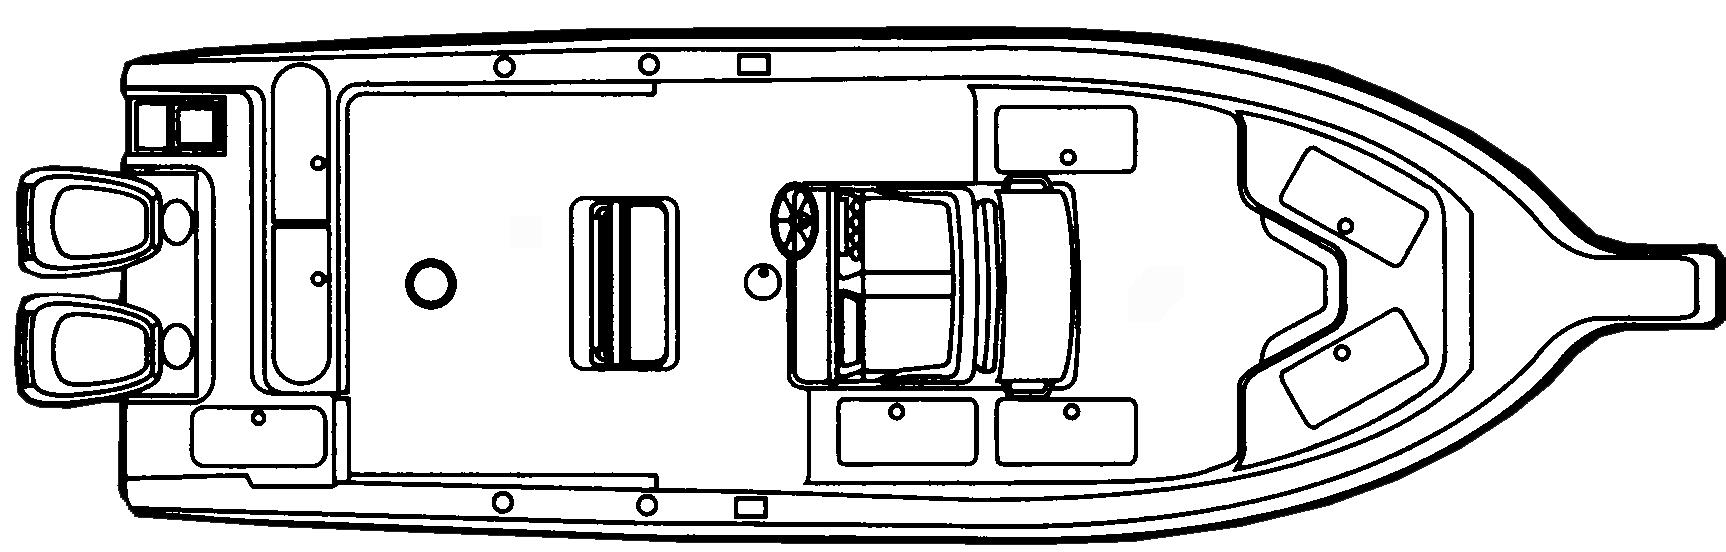 314 Center Console Floor Plan 1